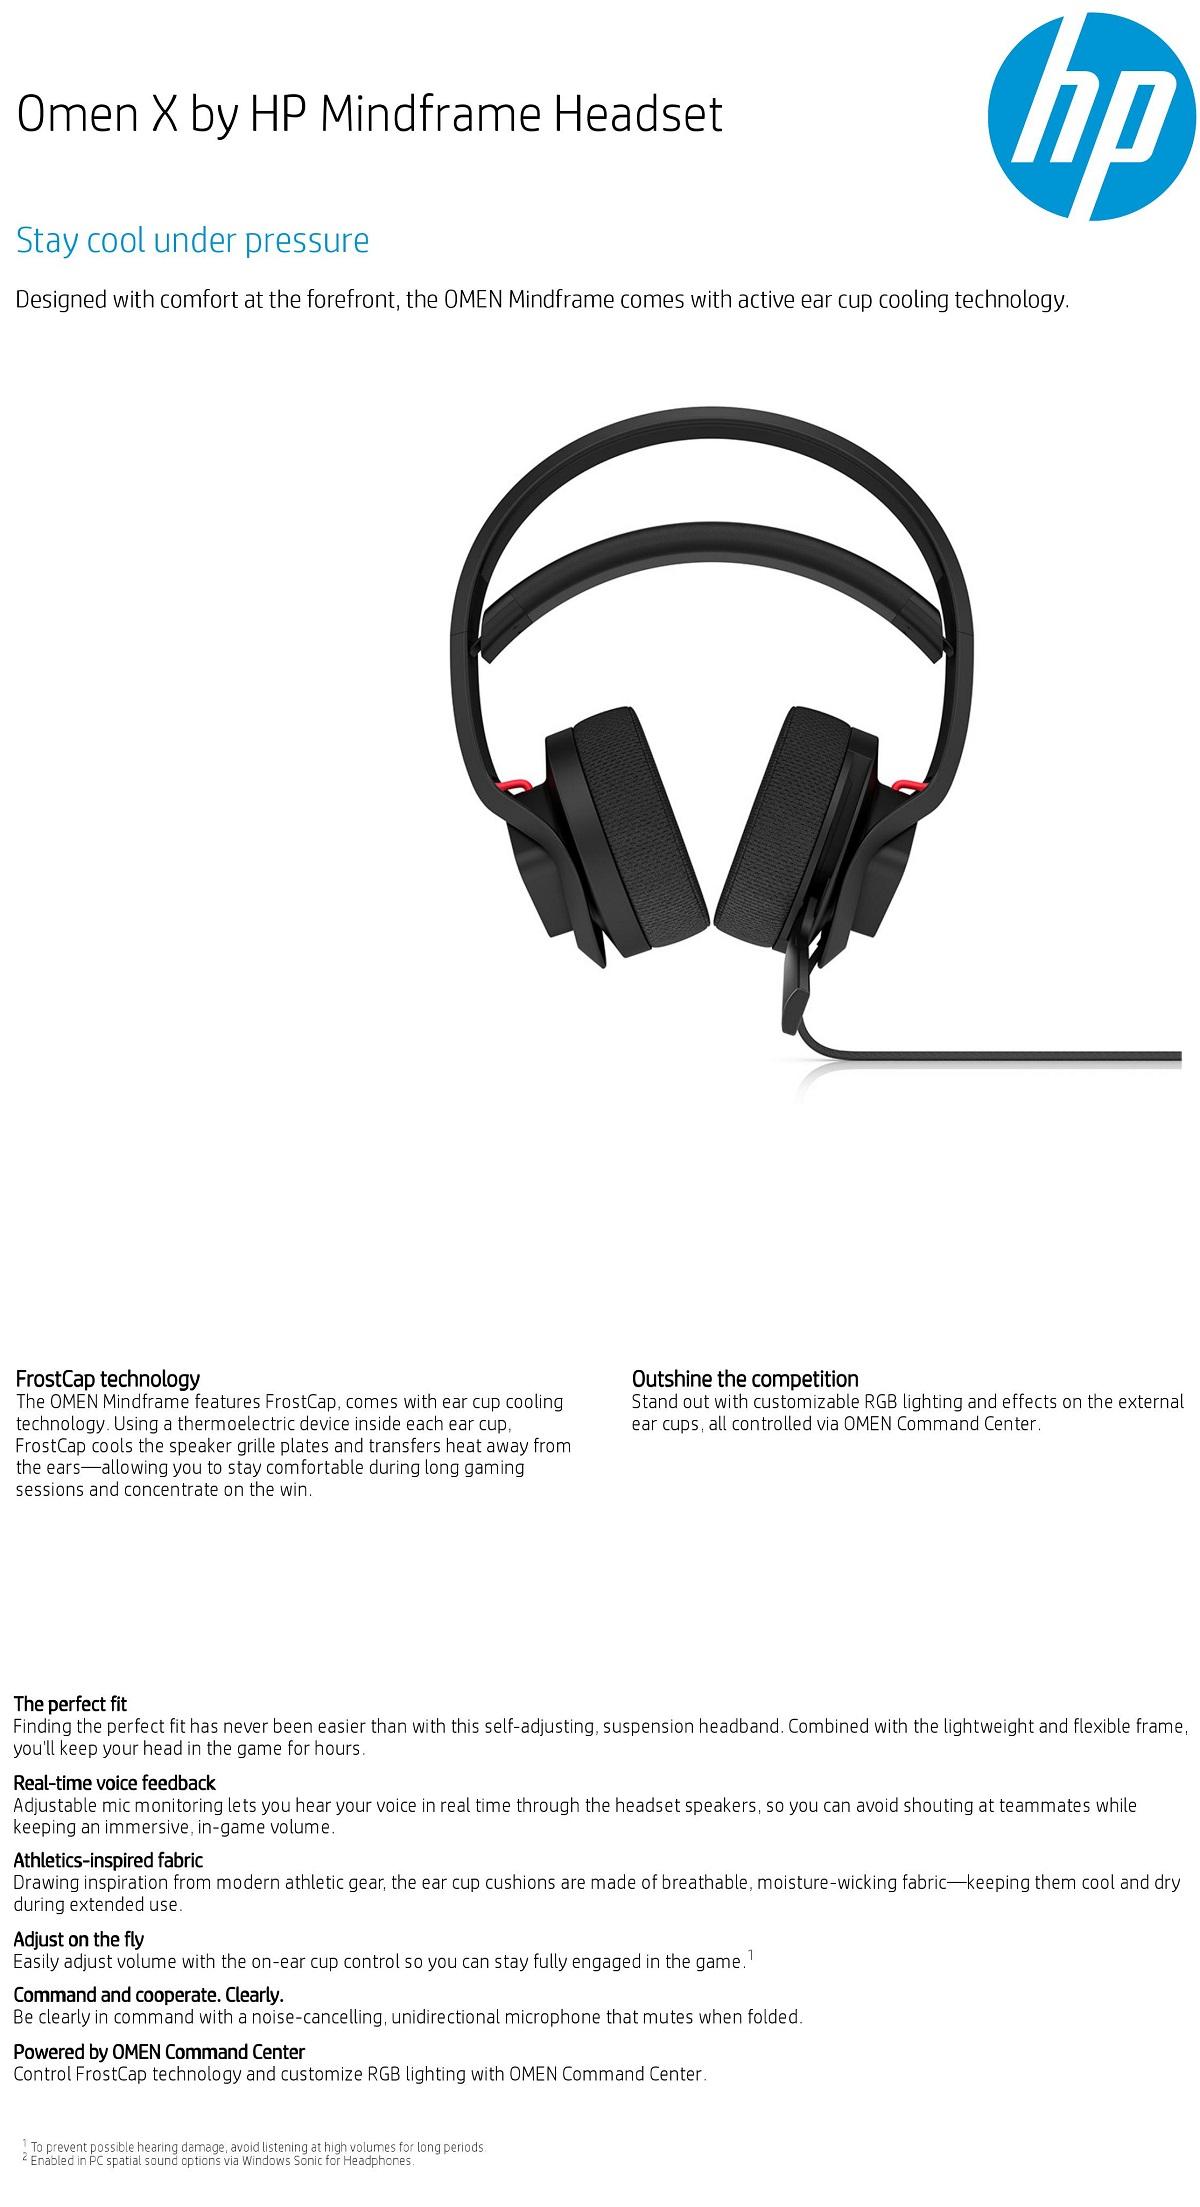 Details about HP OMEN X Mindframe Surround Sound 7 1 USB Gaming Headset  Black/Red RGB Frostcap